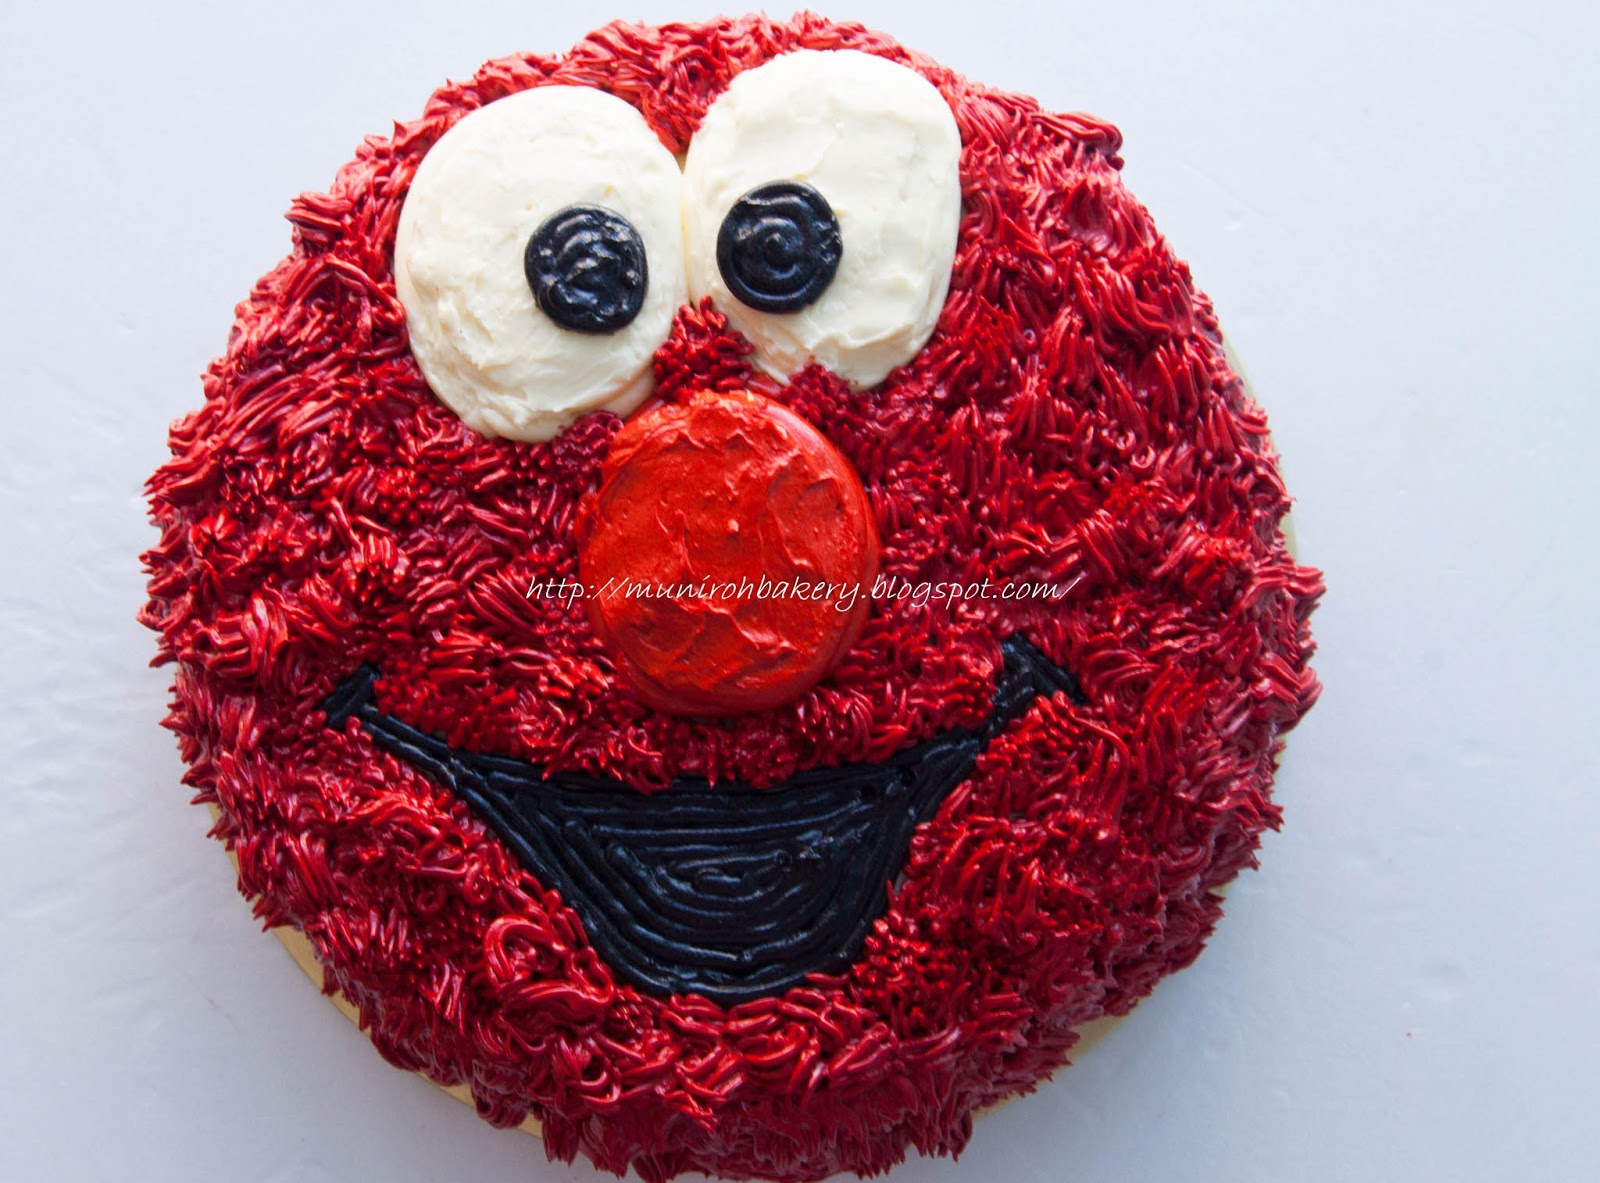 velvet cake red velvet cake red velvet cake red velvet cake red velvet ...